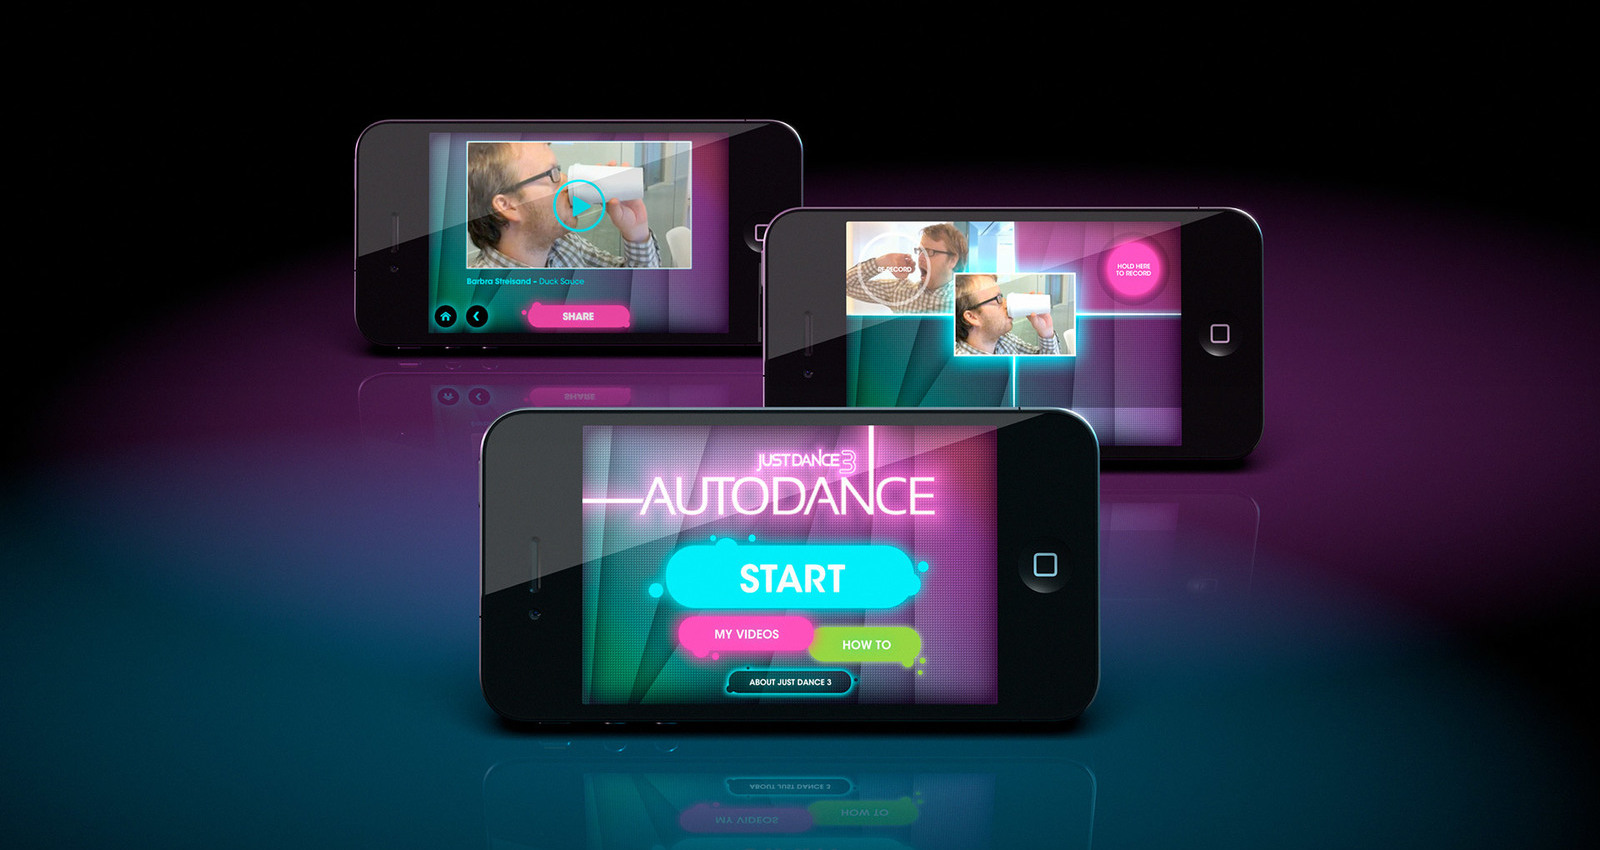 Autodance